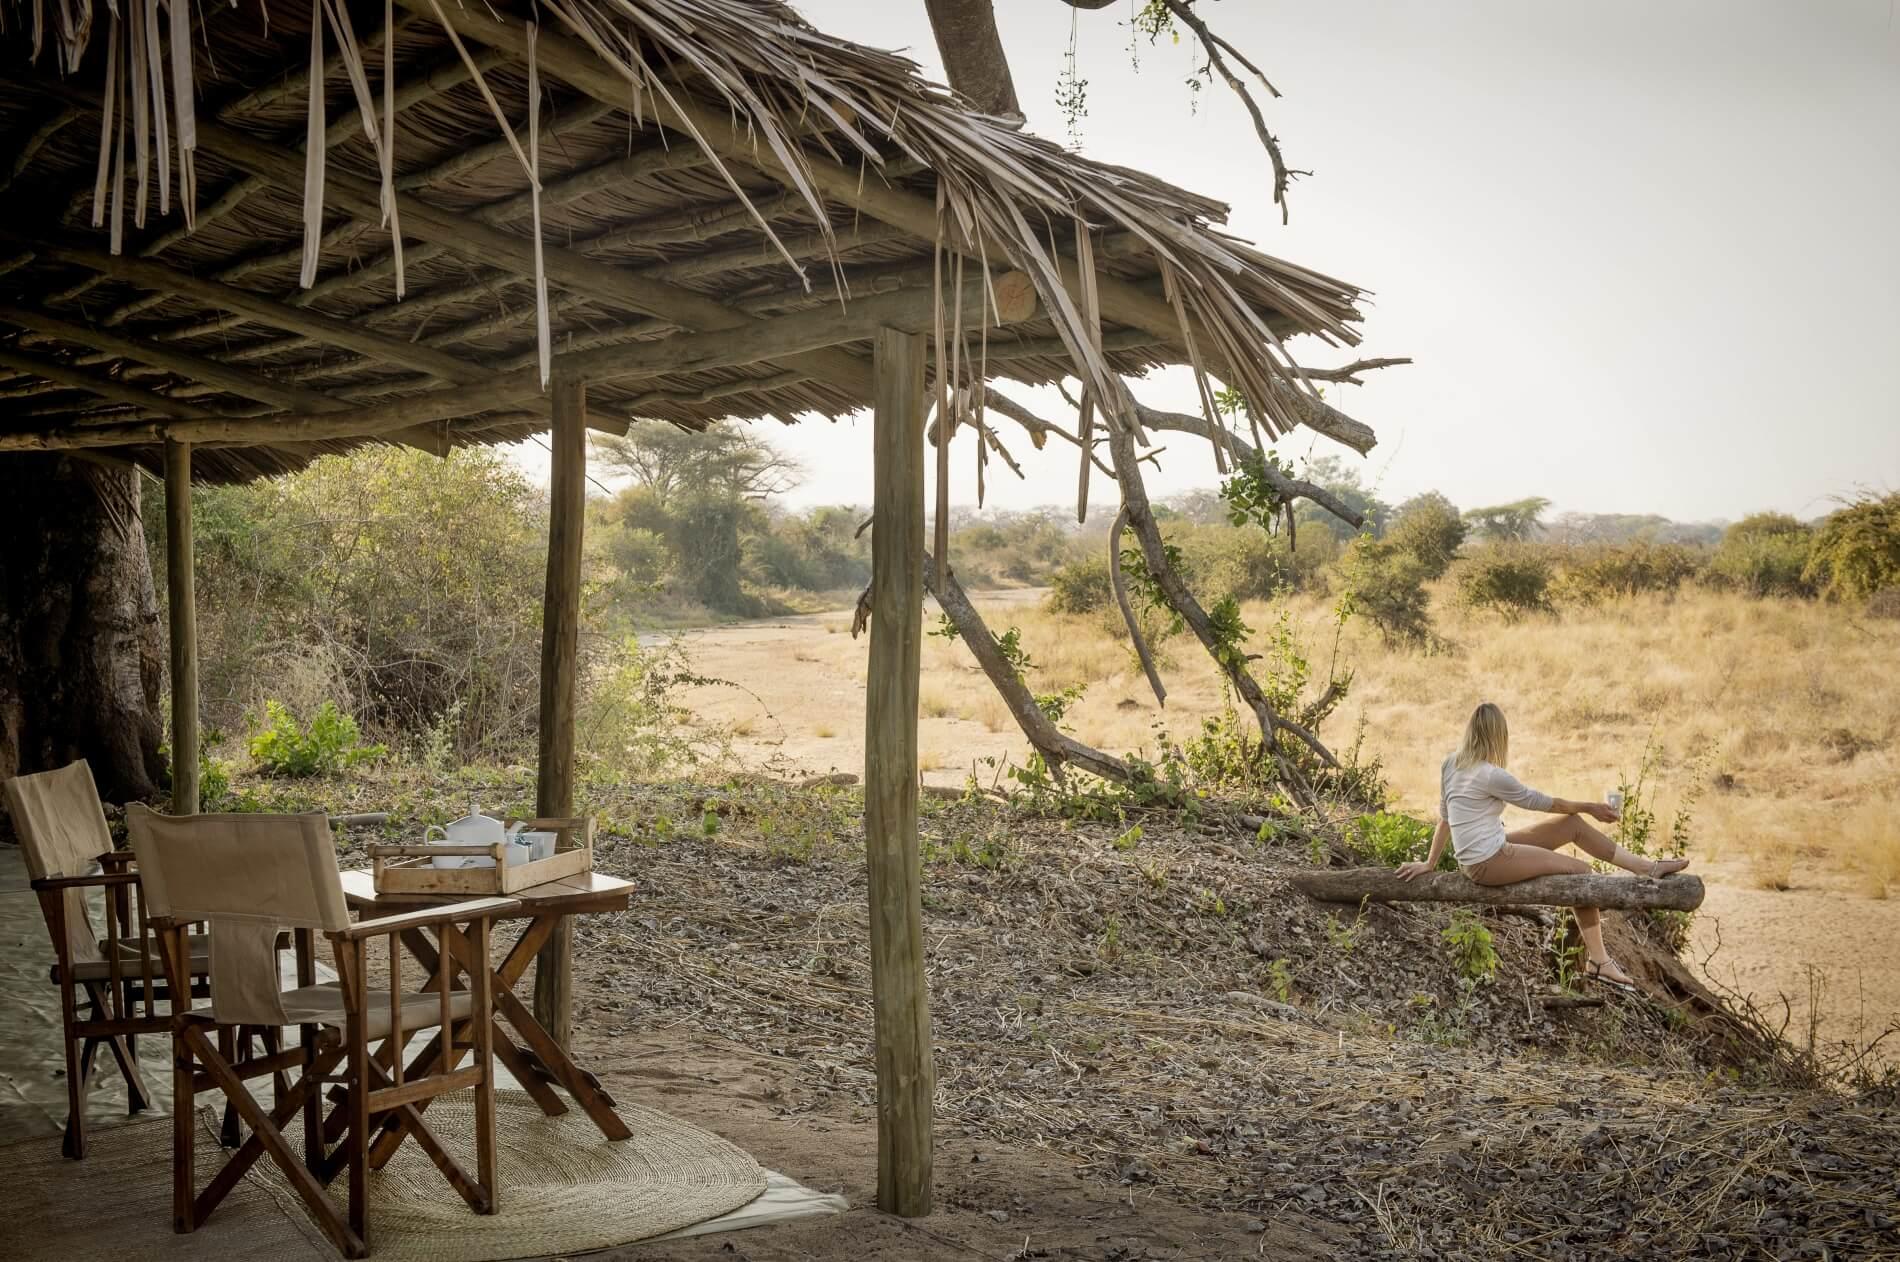 Nomad Kigelia Camp